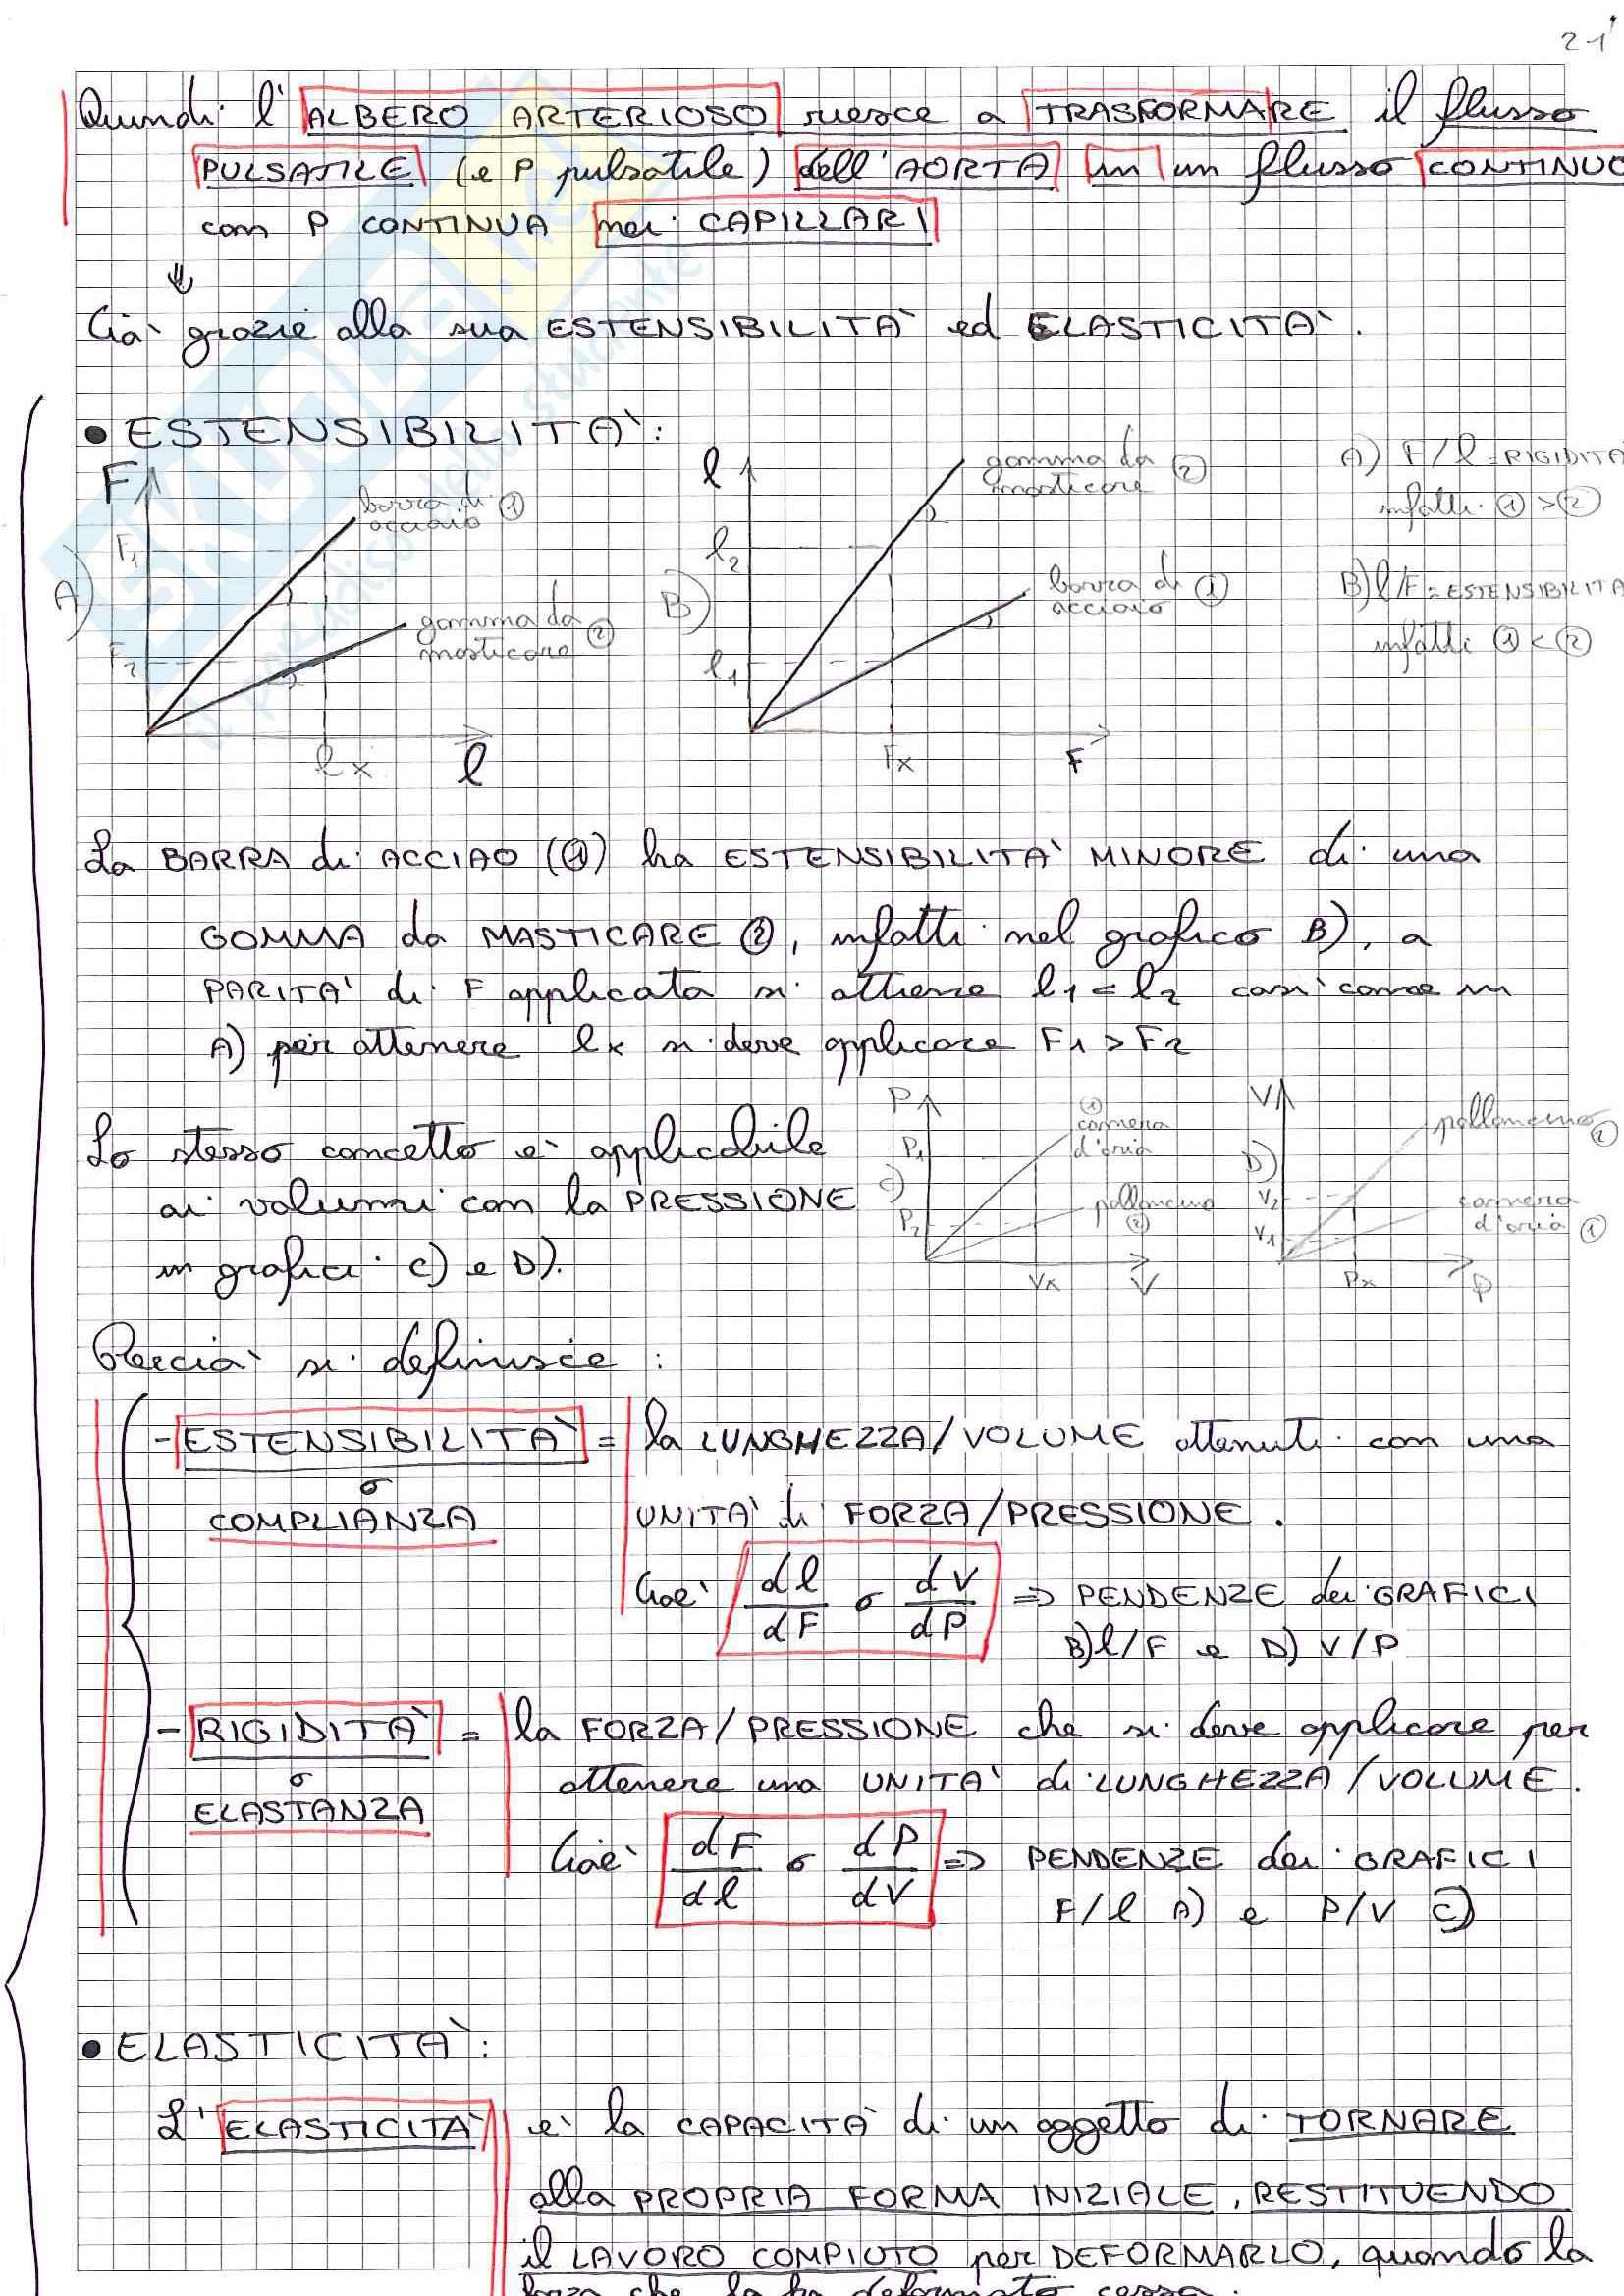 Riassunto esame Fisiologia, prof Minetti, libro consigliato Fisiologia Umana, Baldissera (parte 1) Pag. 41